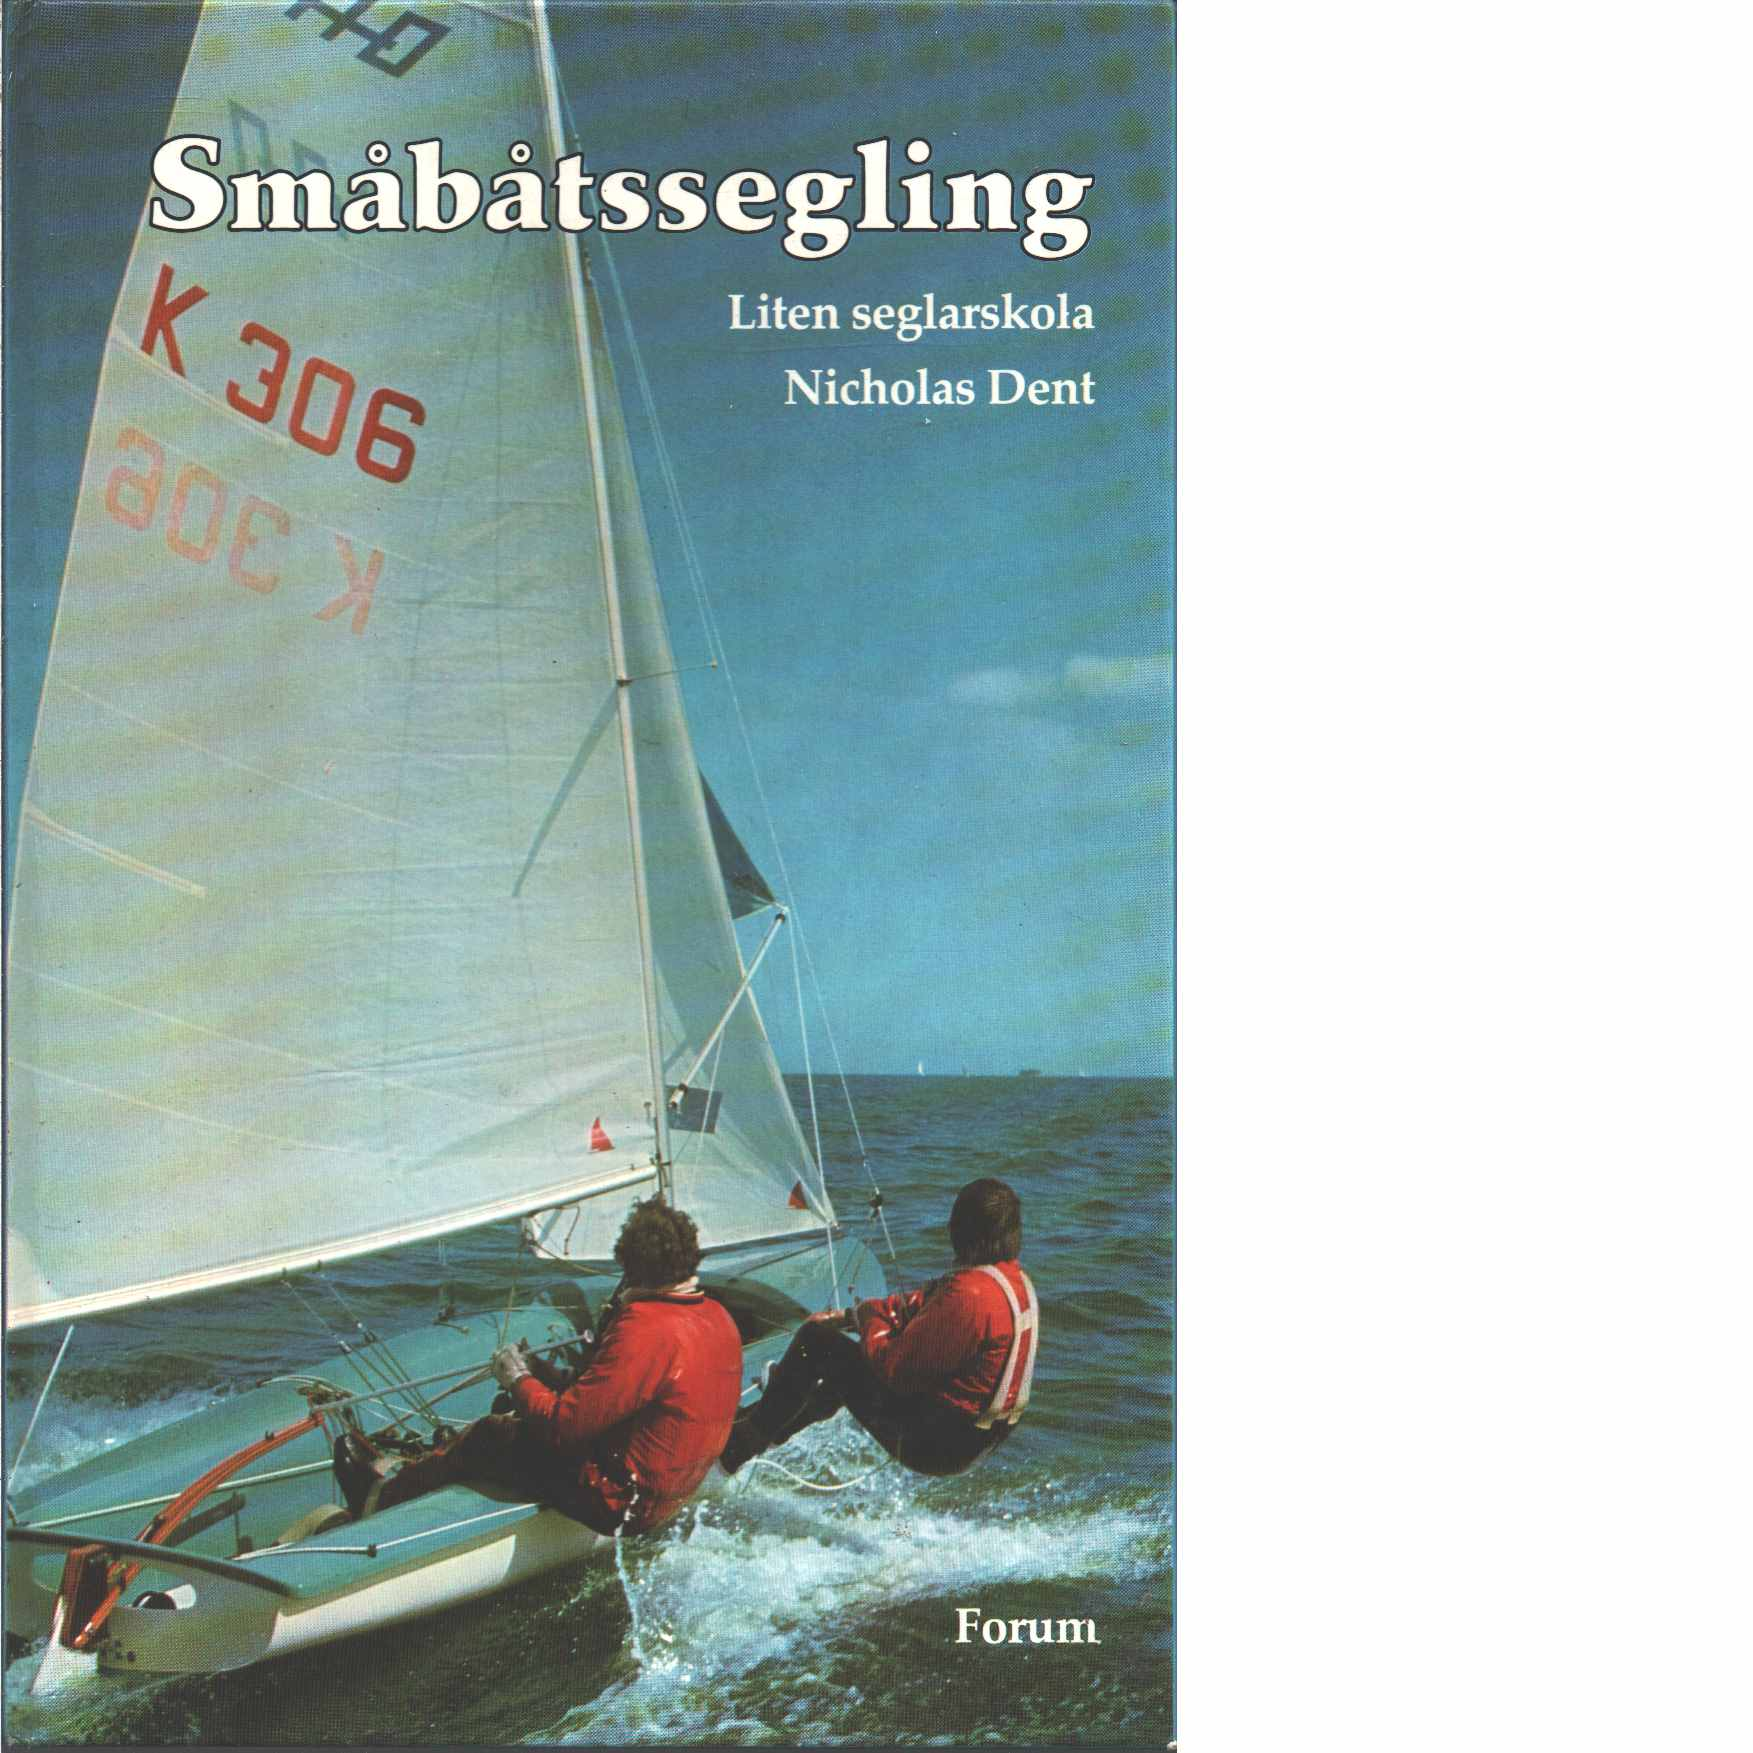 Småbåtssegling : liten seglarskola - Dent, Nicholas